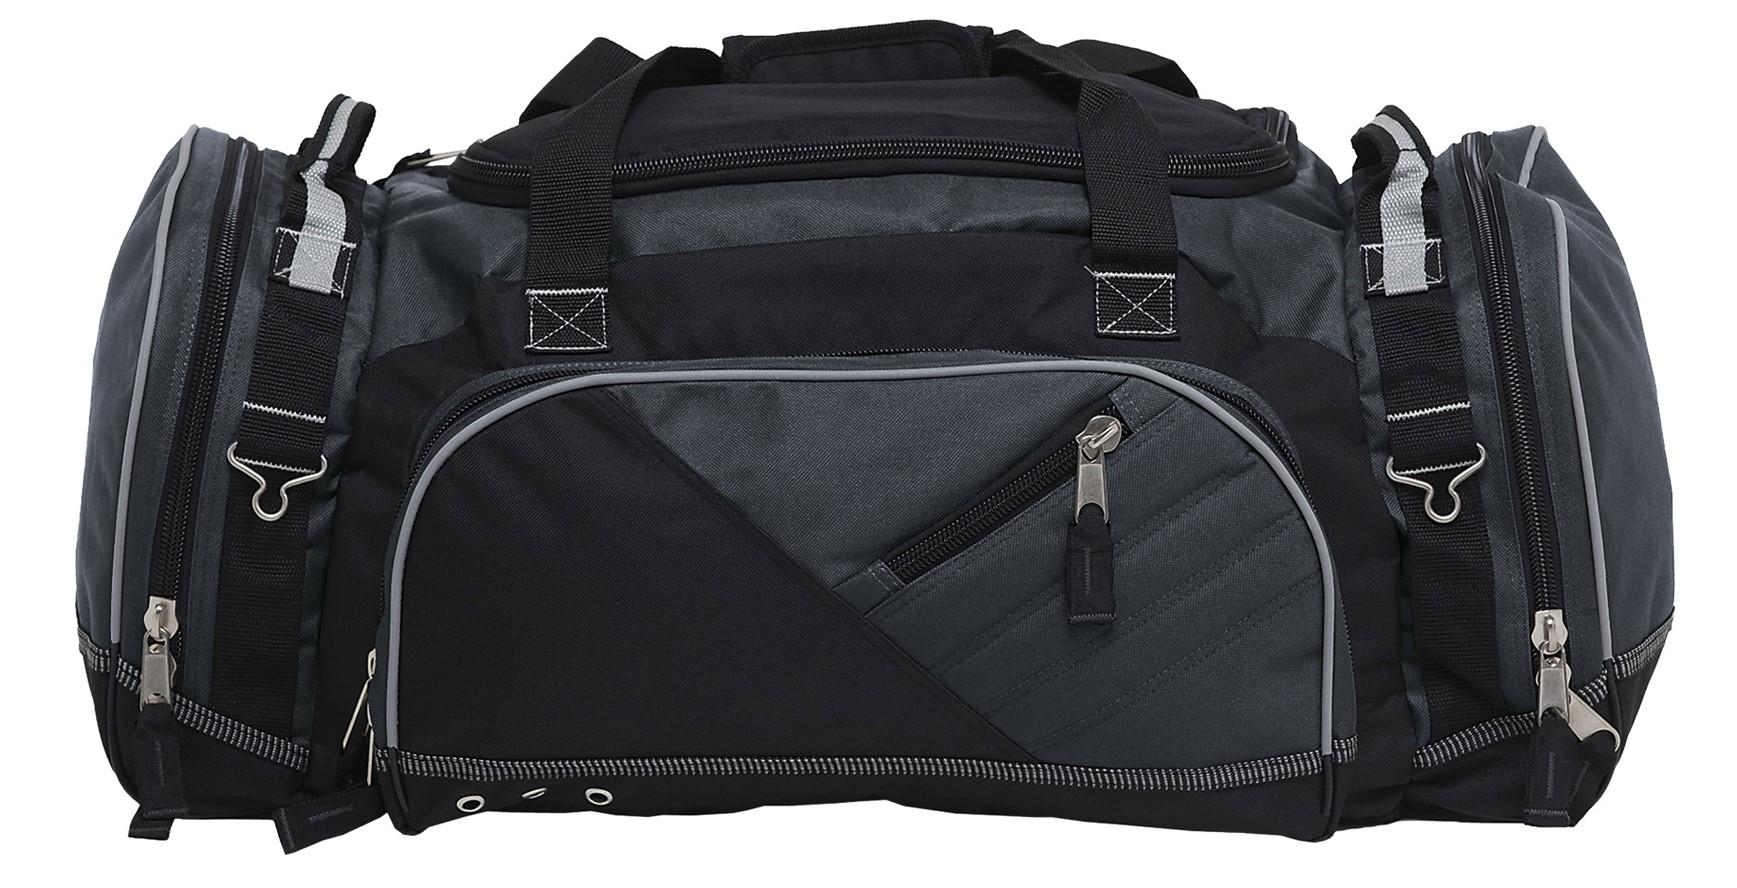 Recon Sports Bag - Black & Charcoal